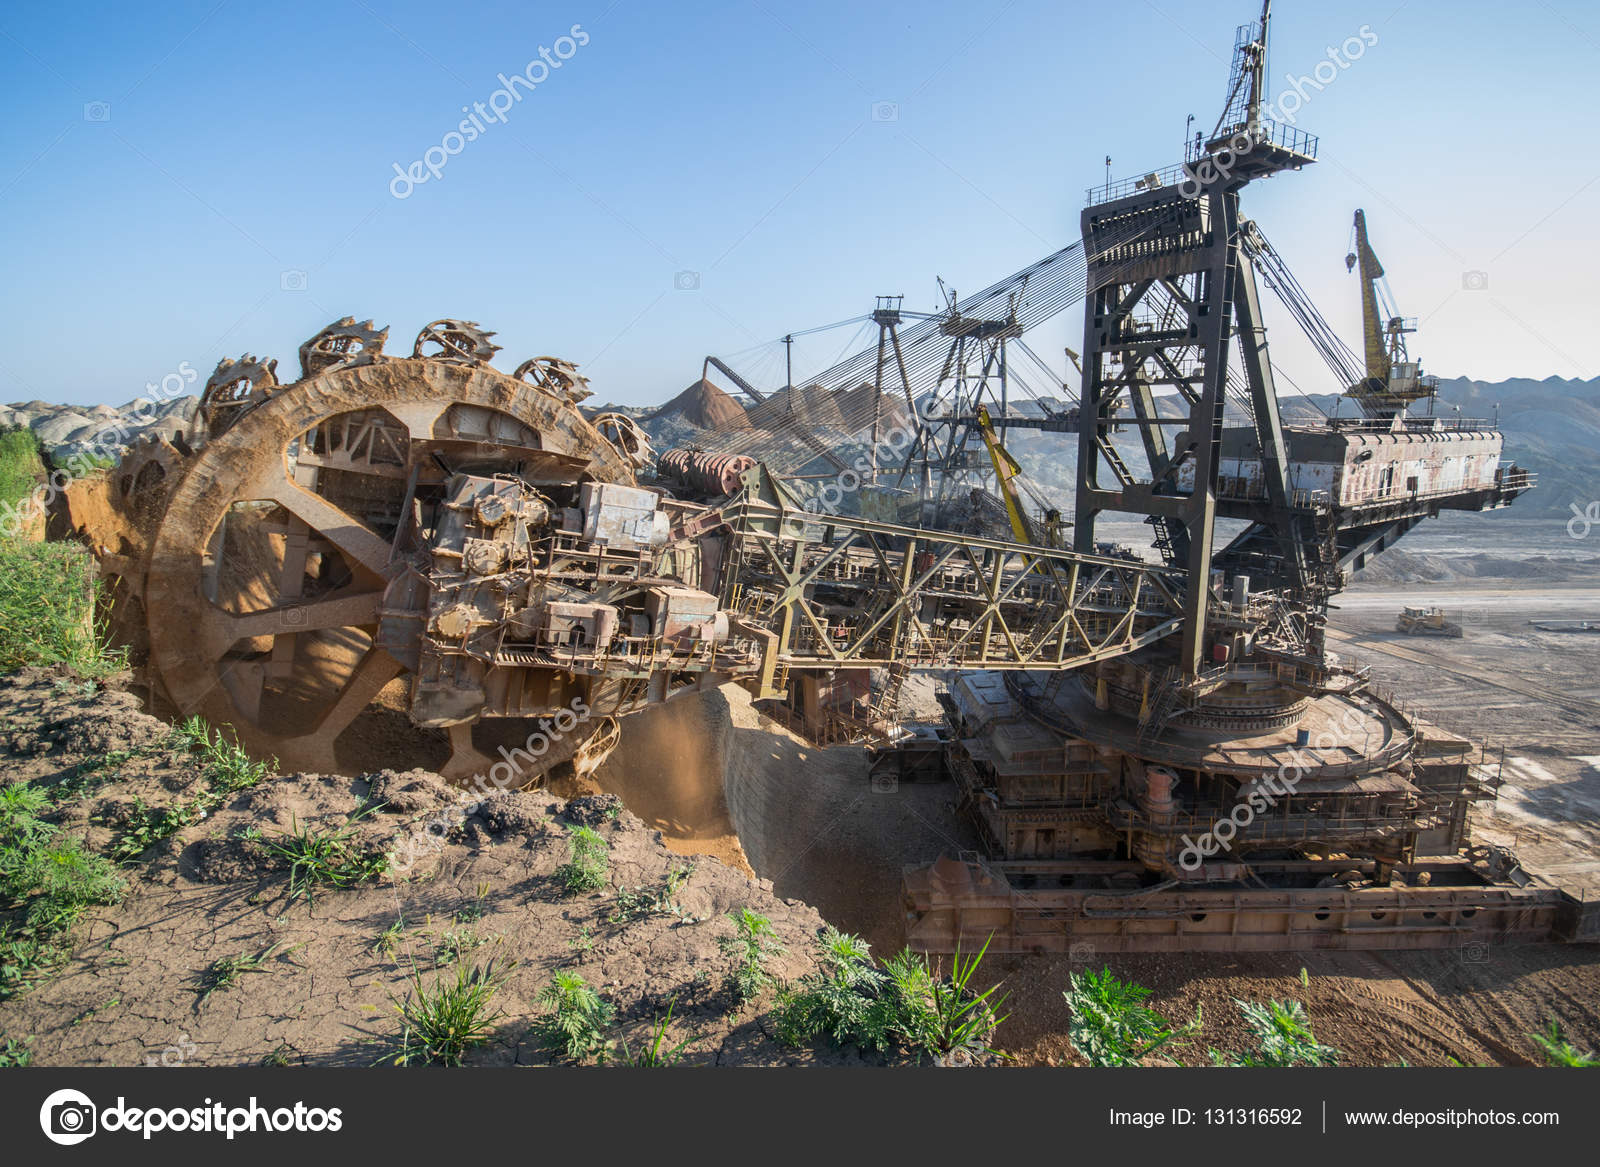 Biggest Excavator In The World Working Bagger 228 Ukraine Big Mine Develop Mineral Resources Excavator Digs Metallurgy In Ukraine Stock Photo C Mysokol 131316592